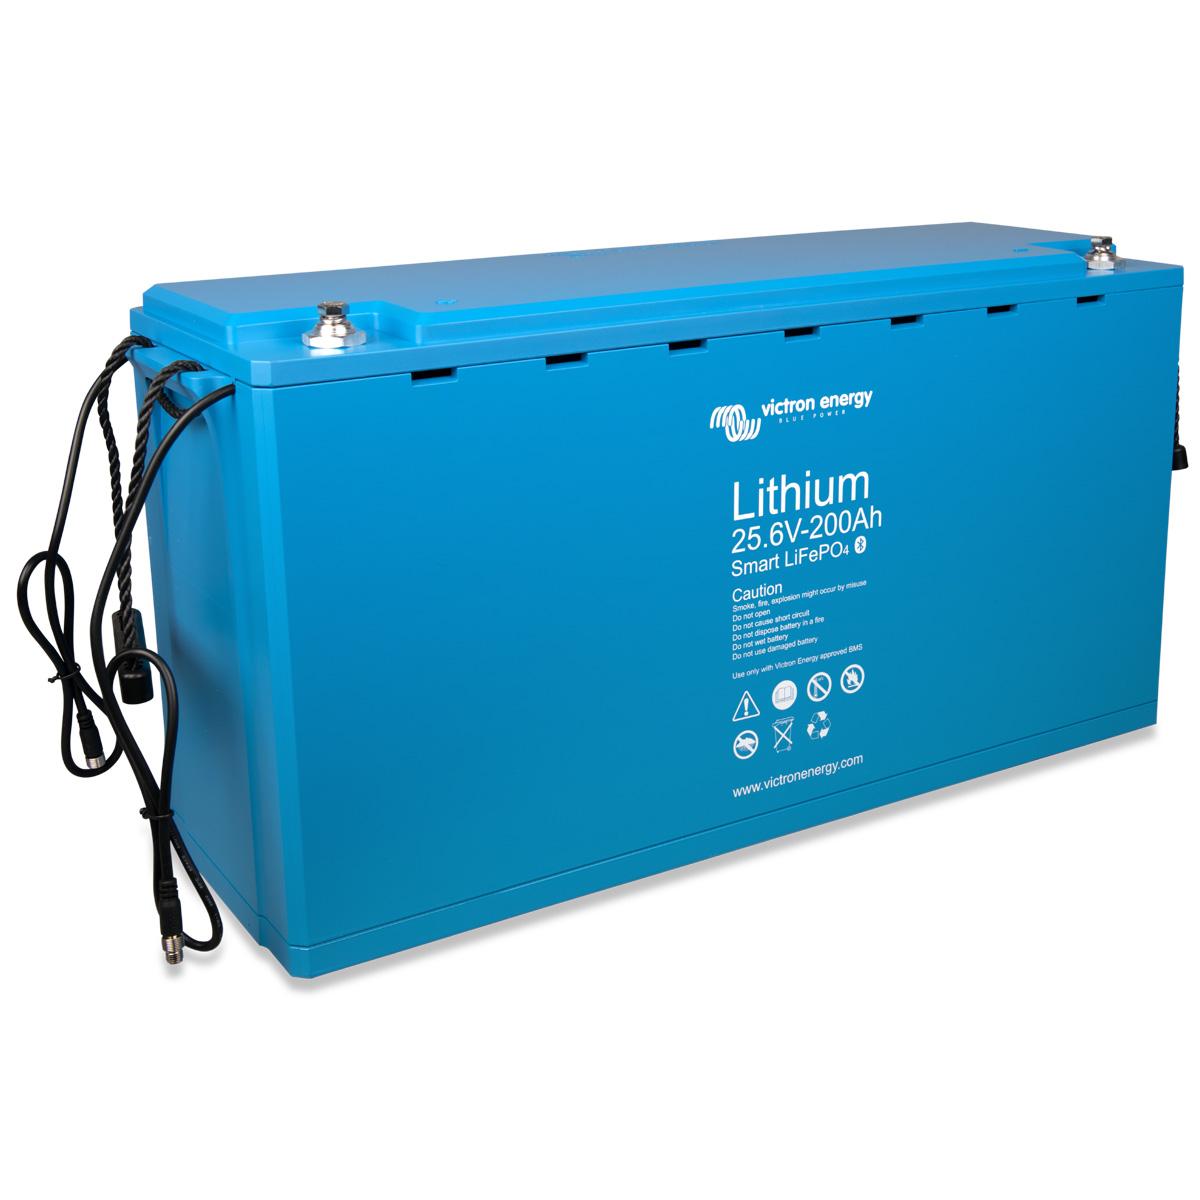 Victron LiFePo4 Akku 25,6V / 200Ah - Smart